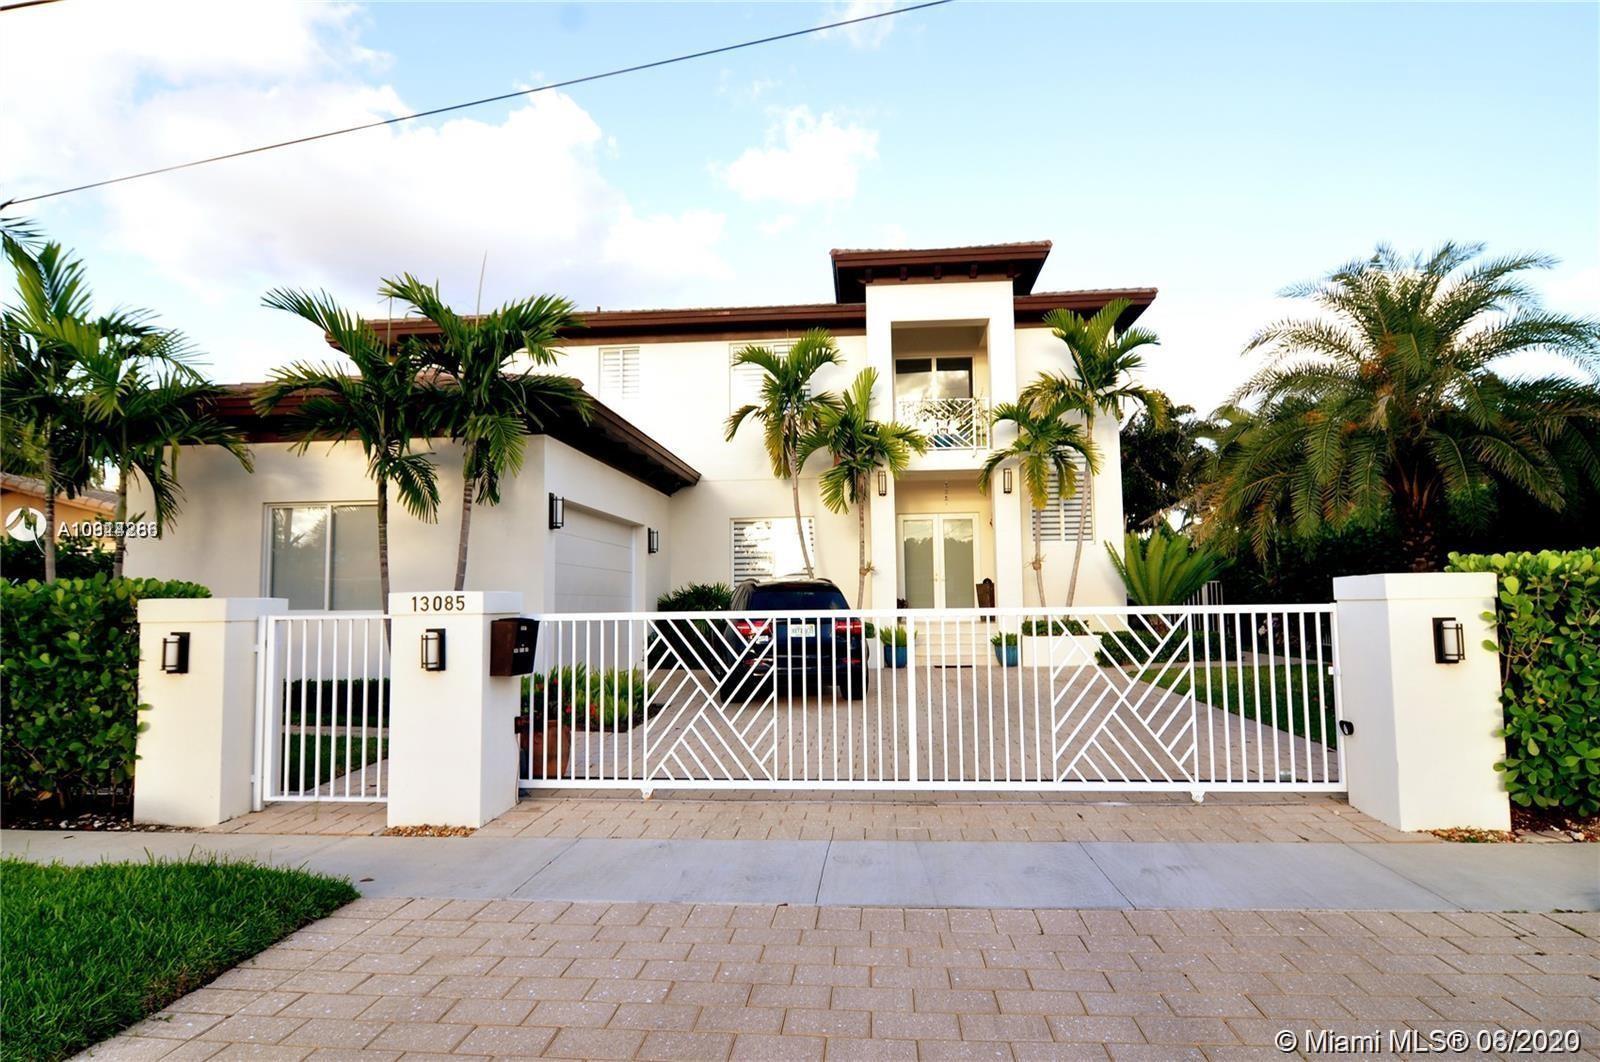 Keystone Point - 13085 Ortega, North Miami, FL 33181